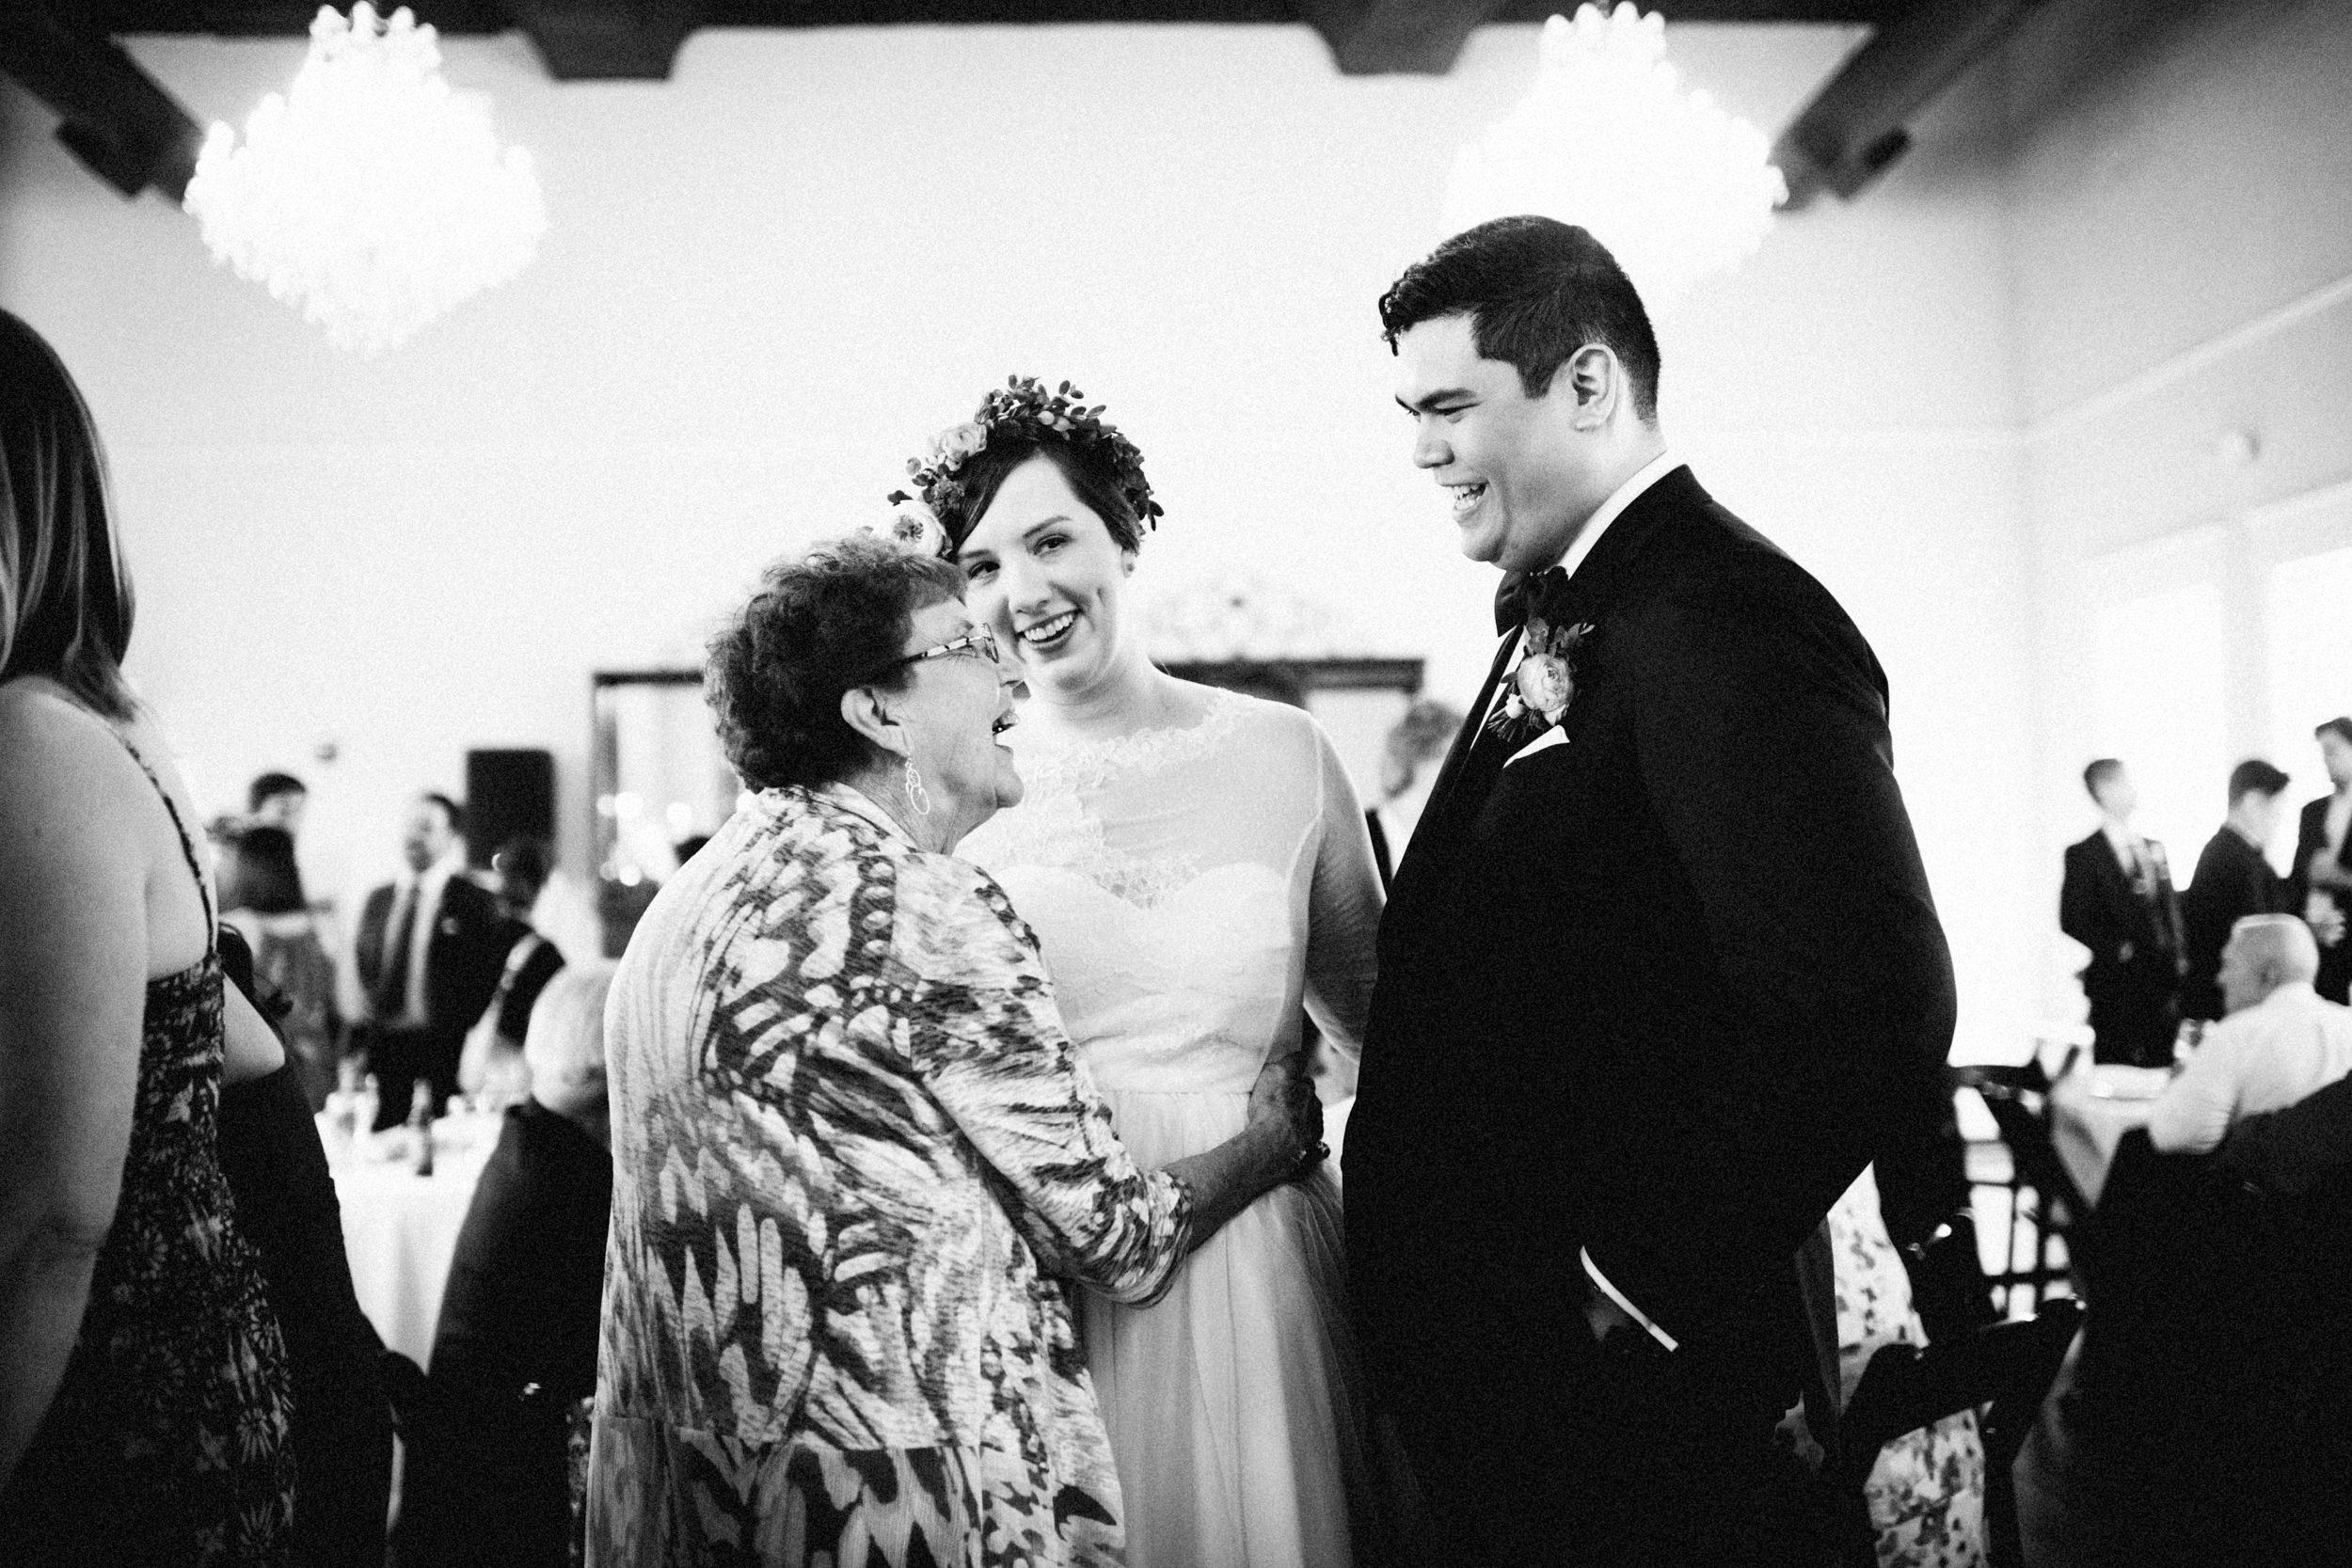 lauren-dean-wedding-grand-lodge-kentucky-sarah-katherine-davis-photography-542edit.jpg